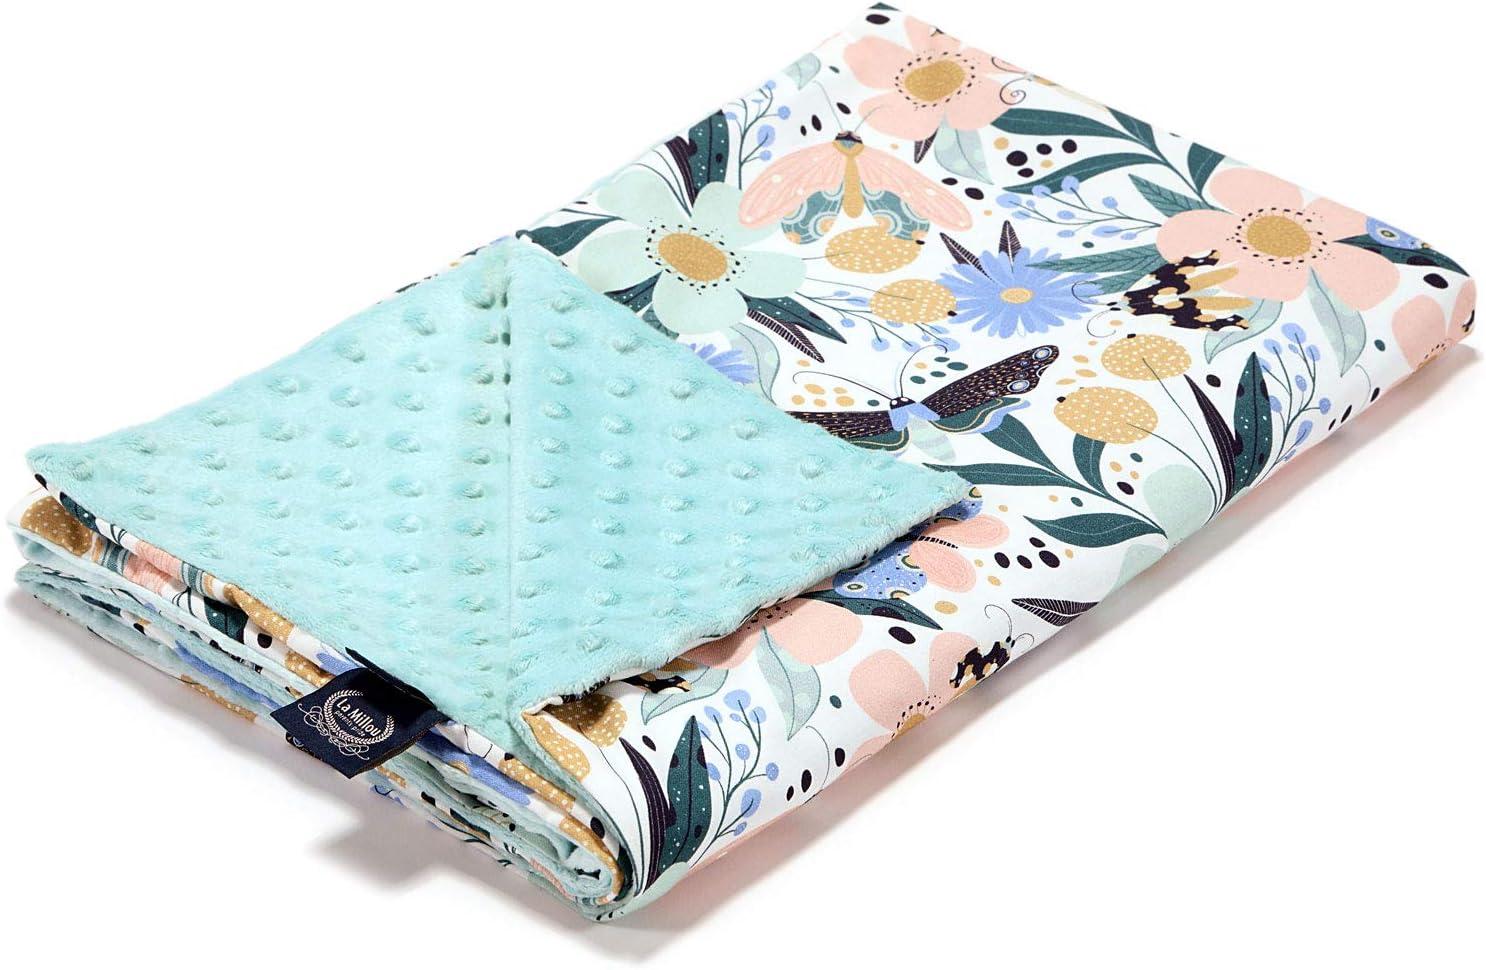 La Millou - Children Blanket 正規逆輸入品 Cotton Fairy X Minky 期間限定特価品 44 55in